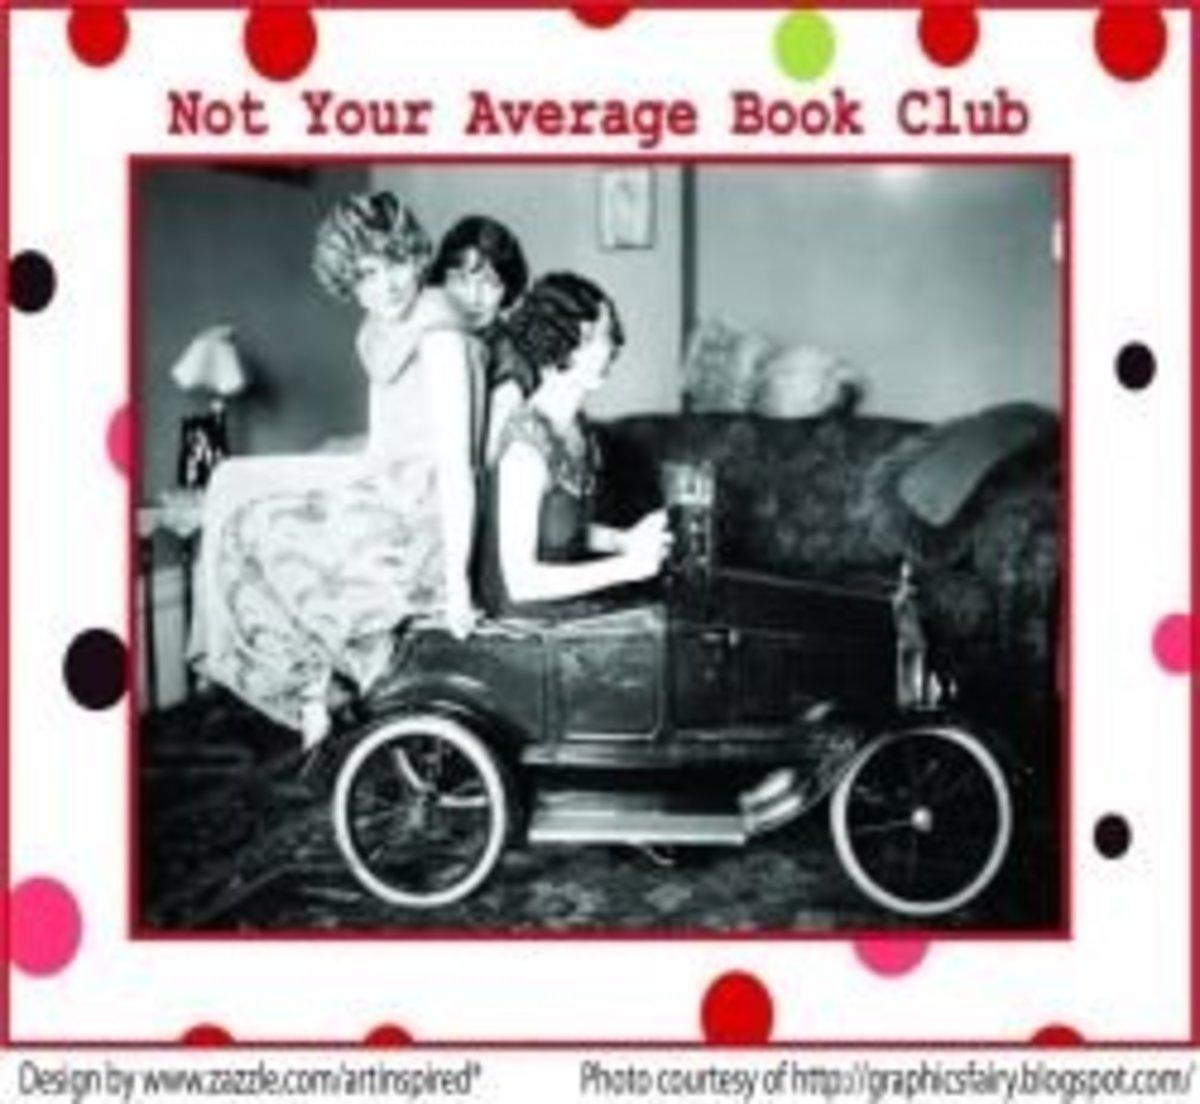 Book Club Names